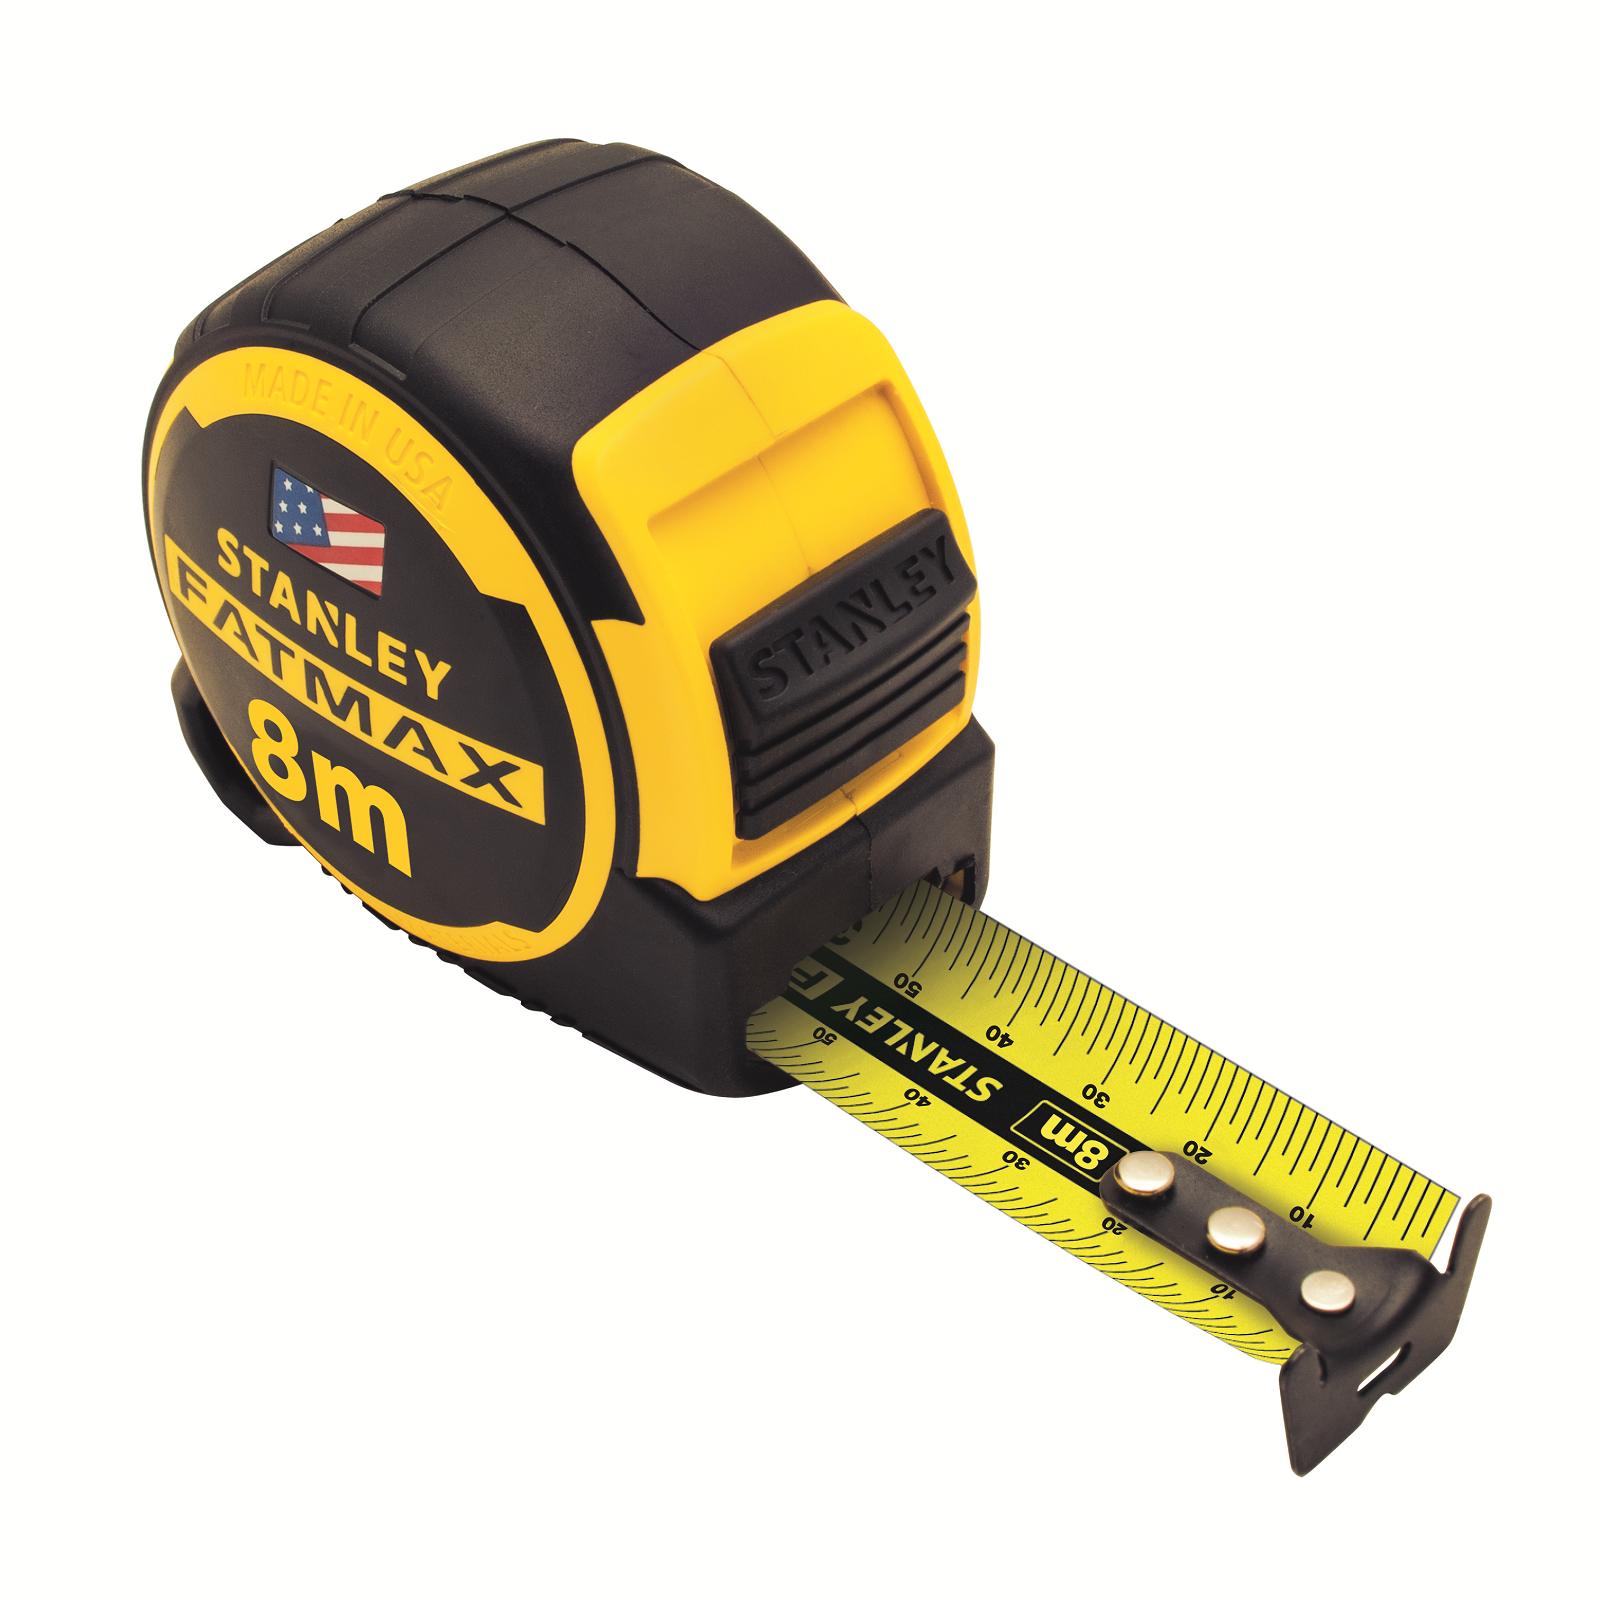 Stanley FatMax 8m Next Gen Tape Measure